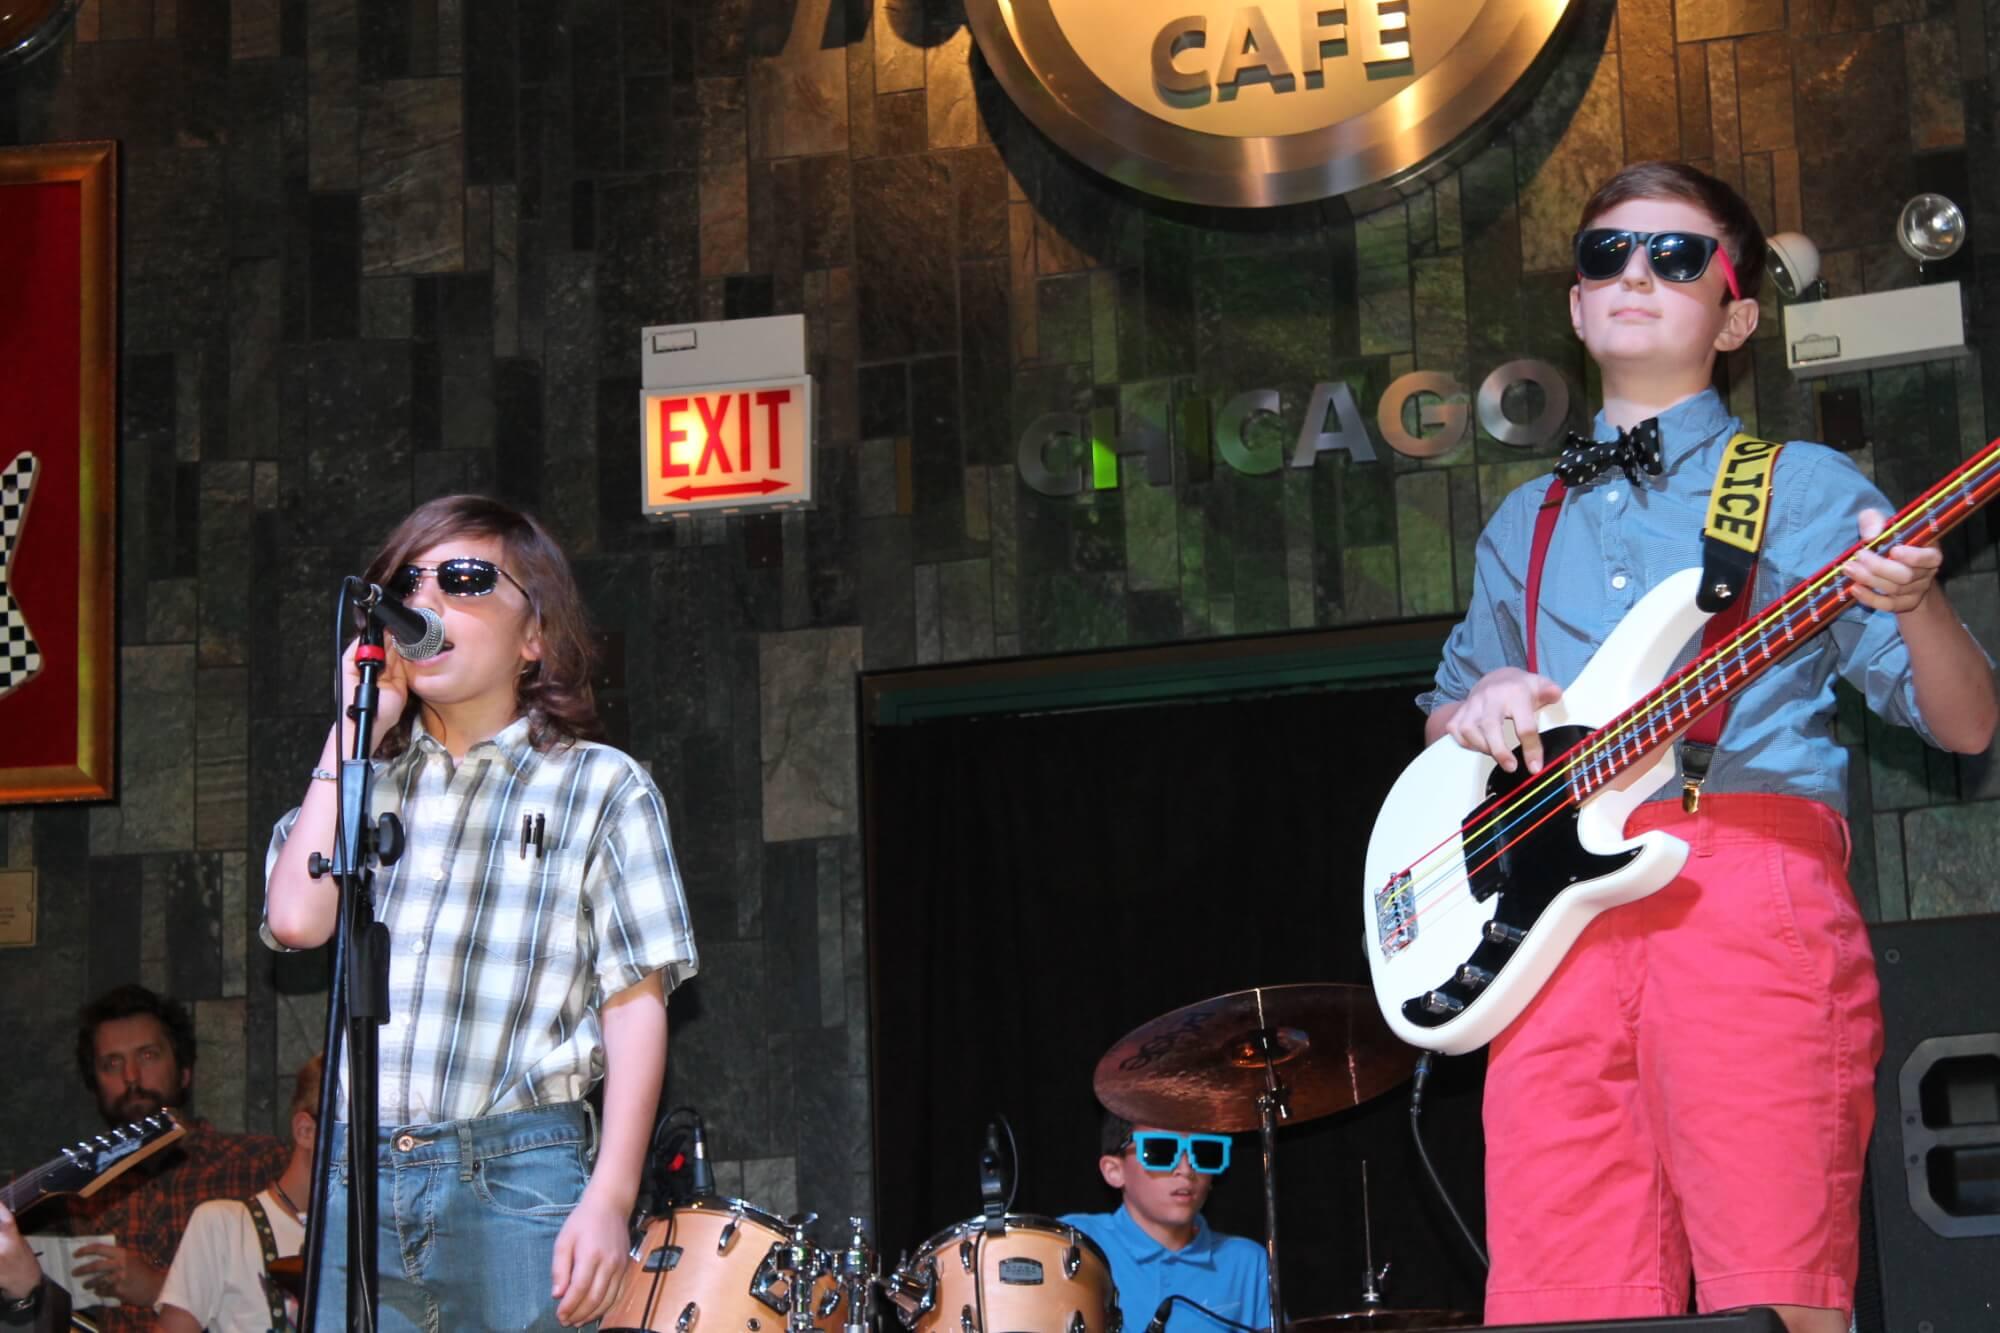 Nerd Rock at the Hard Rock Cafe!